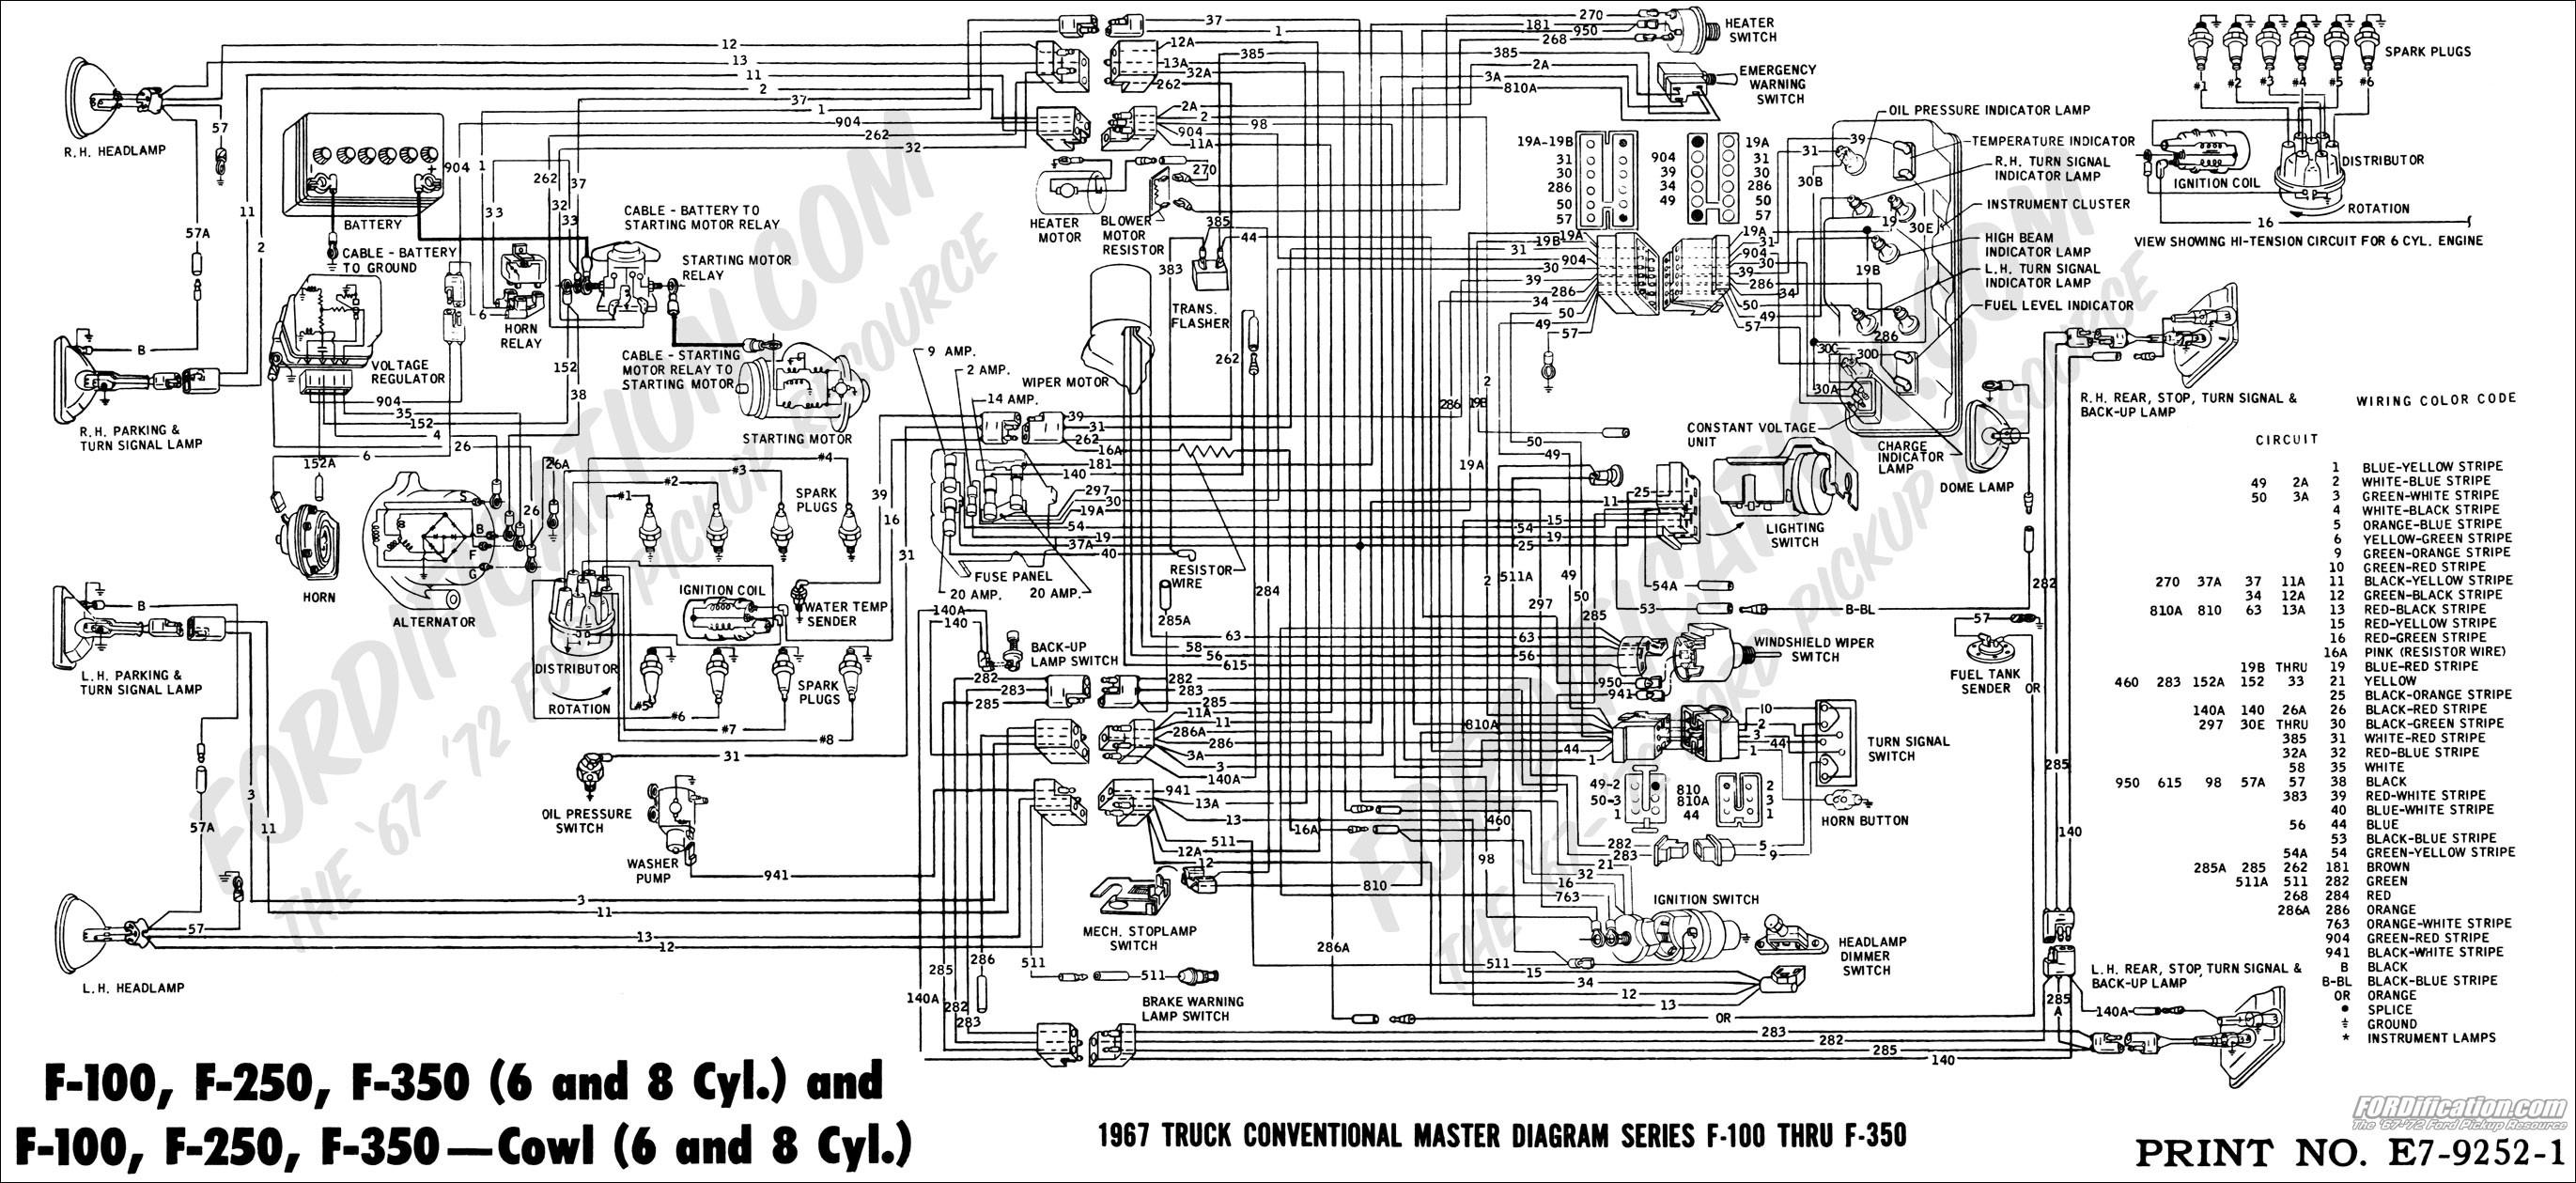 94 ford Ranger Engine Diagram 1983 ford 5 0 Engine Diagram Wiring Diagram Data today Of 94 ford Ranger Engine Diagram ford 3 0 Engine Diagrams Wiring Diagram Pass